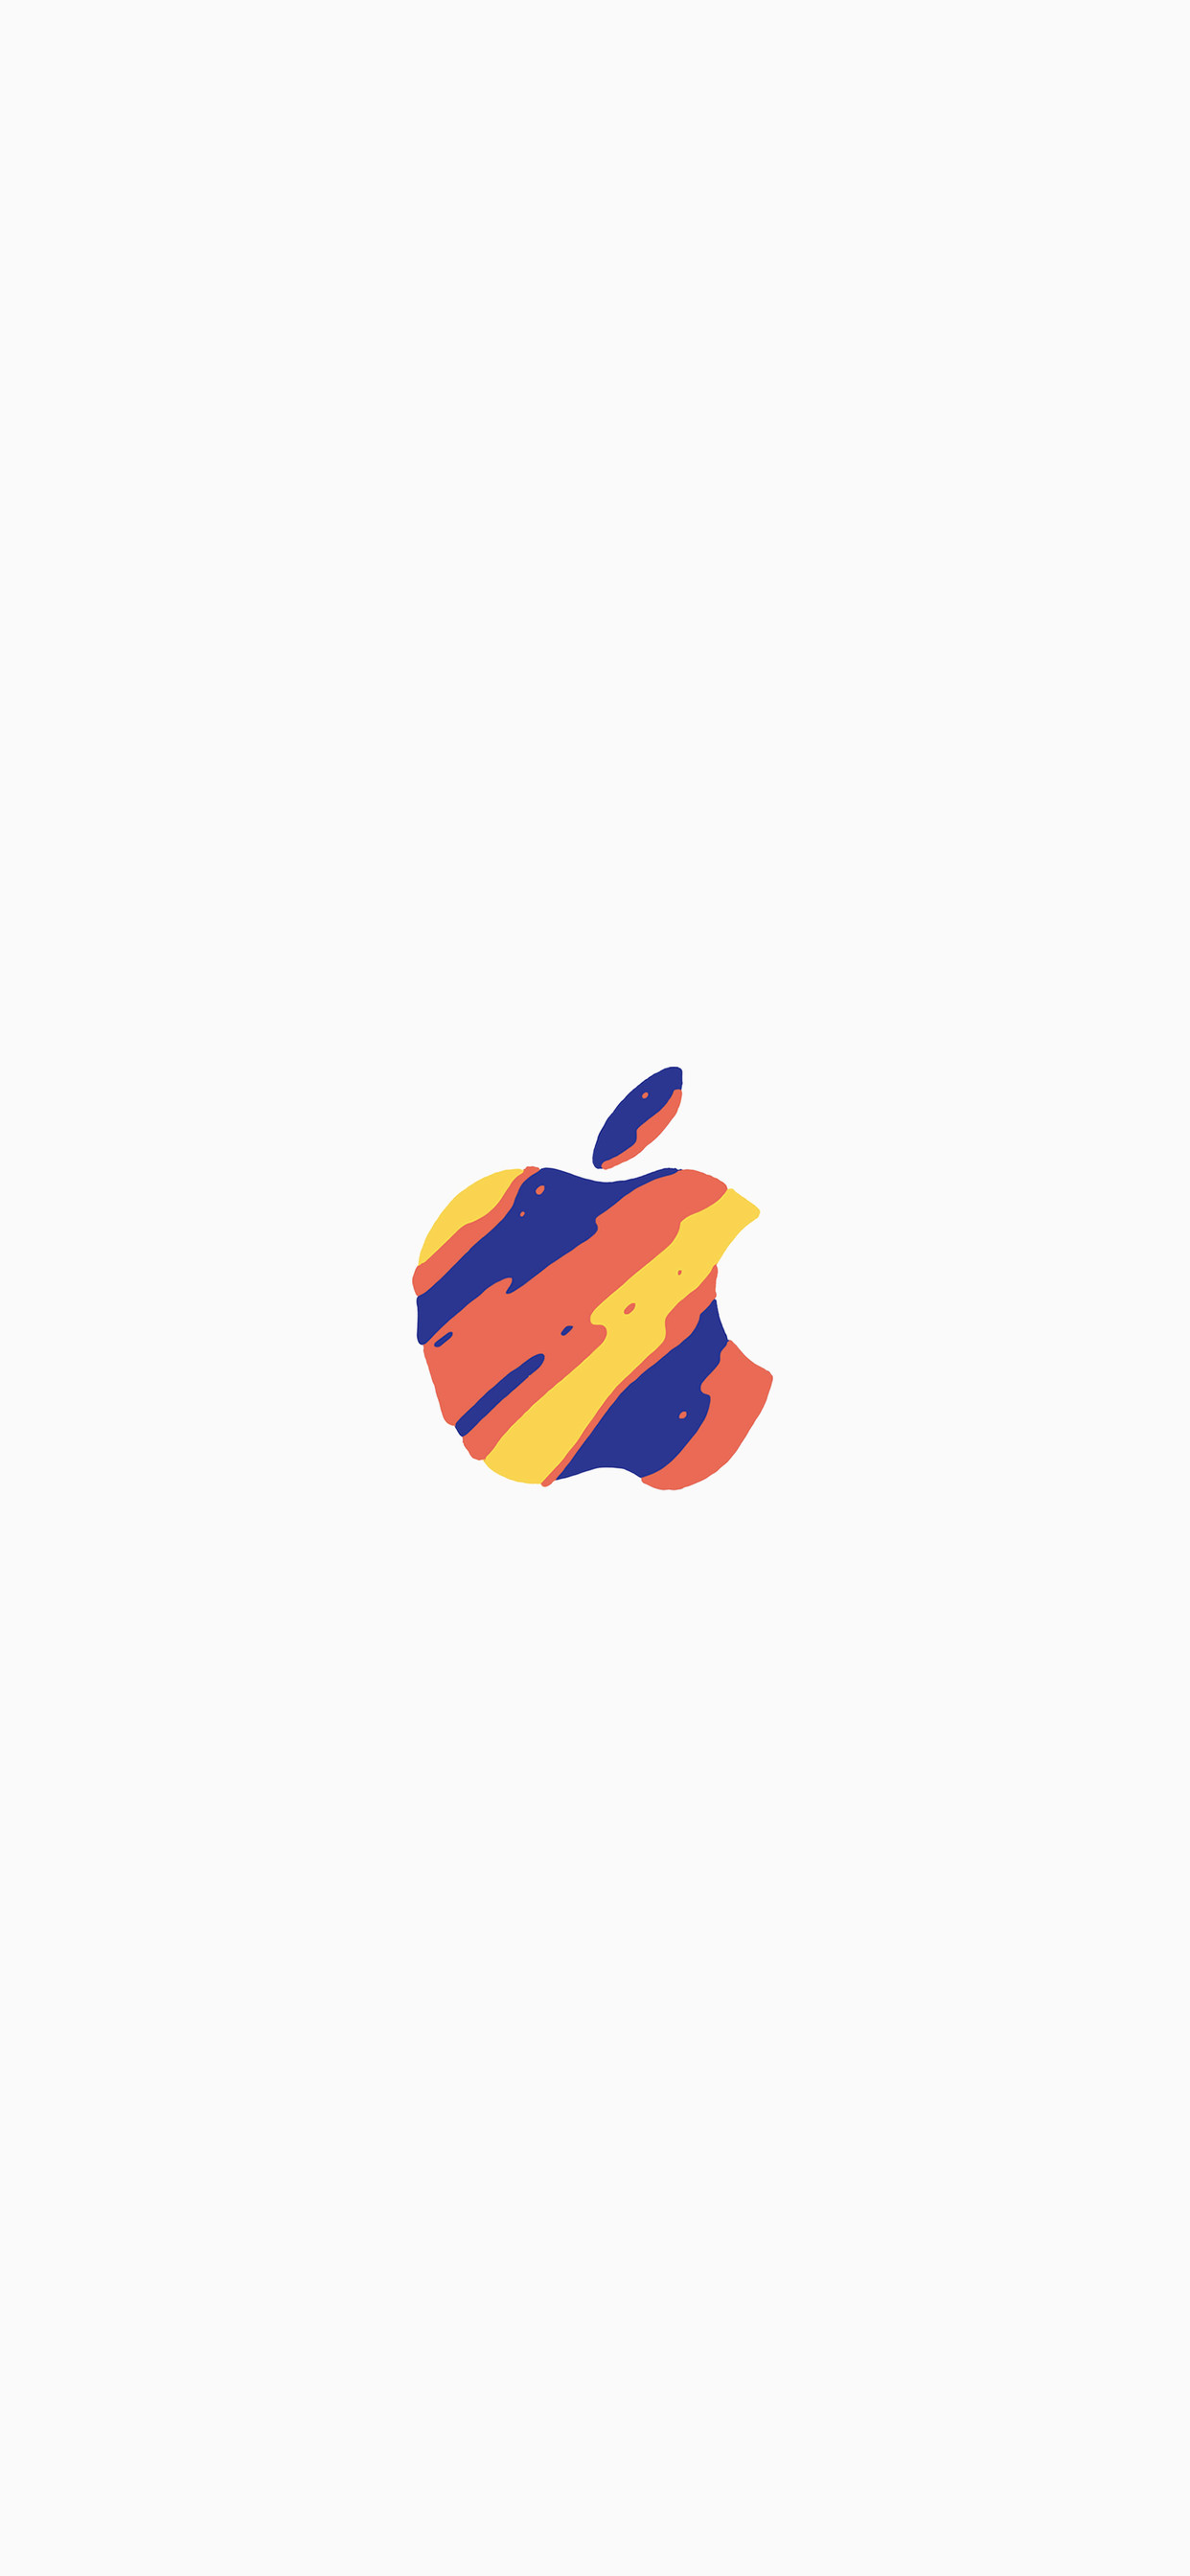 iPhone (Original) \u2014 Everything you need to know! | iMore